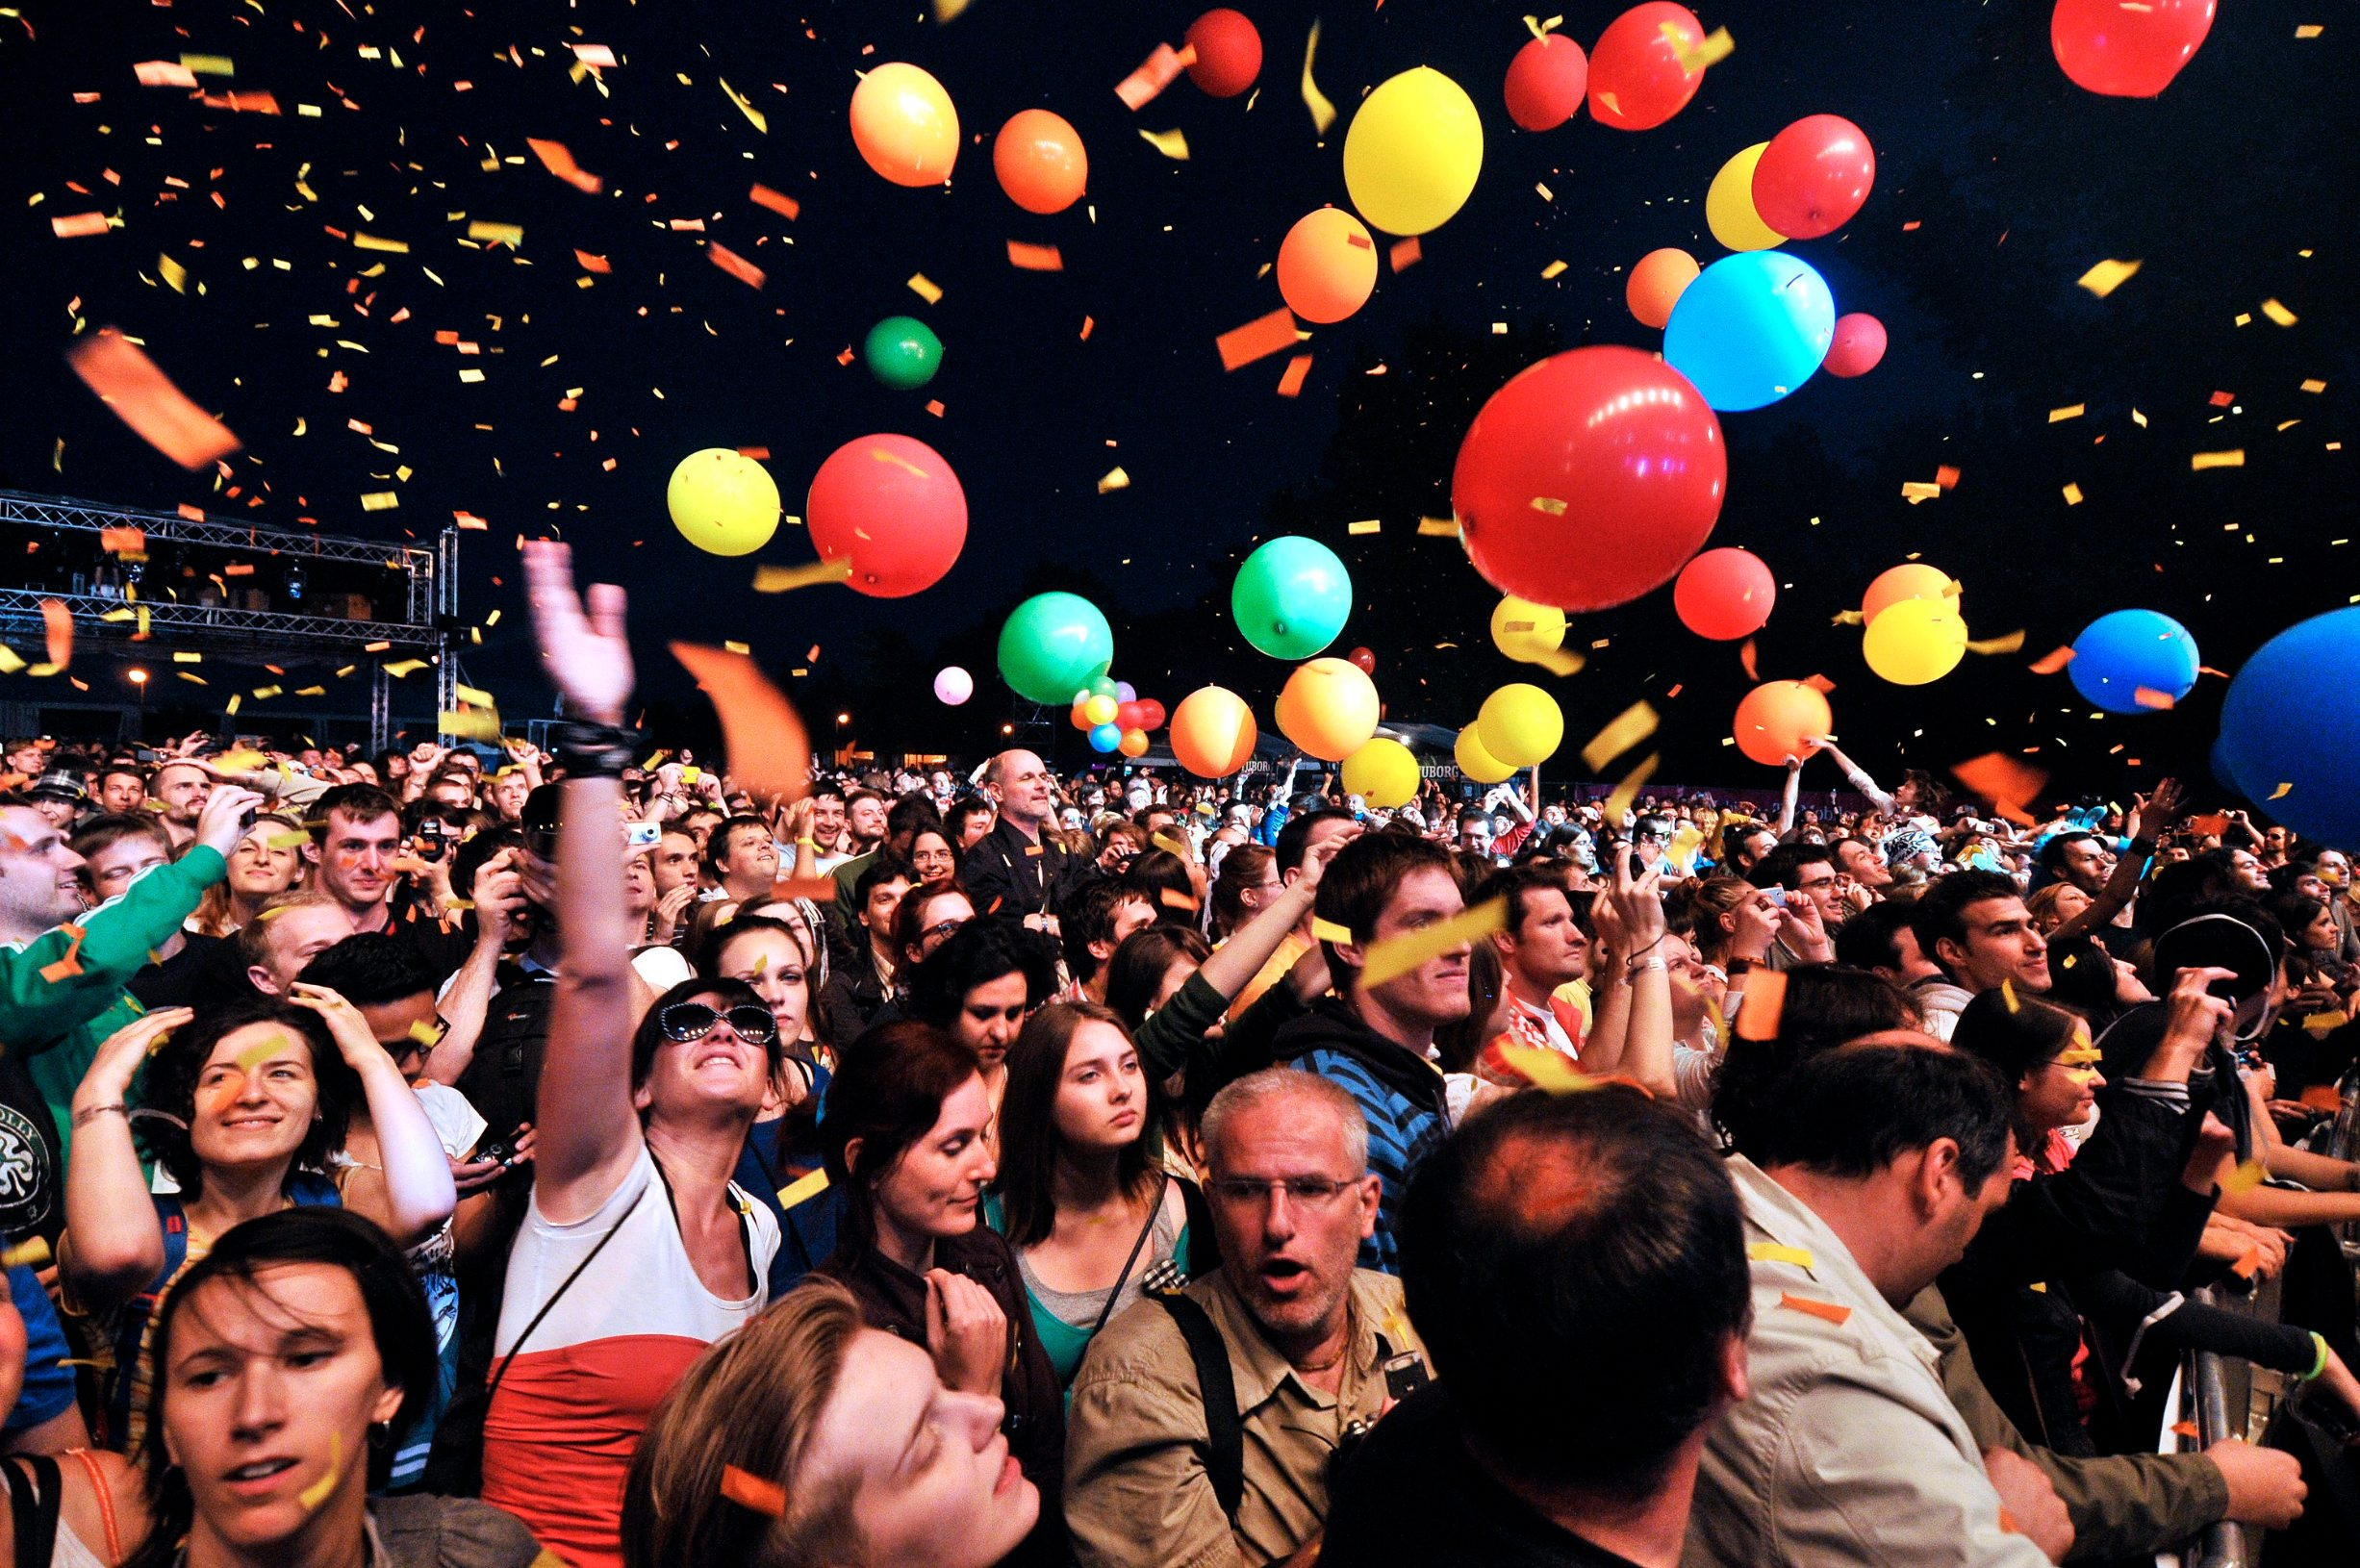 - 2010. U FOTOGRAFIJAMA CROPIX-A -   Zagreb, 230610. Na Jarunu se od 21.-23.06. odrzava glazbeni spektakl T-Mobile INmusic festival na kojem ce nastupiti mnogobrojni izvodjaci kako iz zemlje tako i svijeta. Danas se odrzava zadnji dan festivala. Na fotografiji: The Flaming lips, publika. Foto: Boris Kovacev / CROPIX